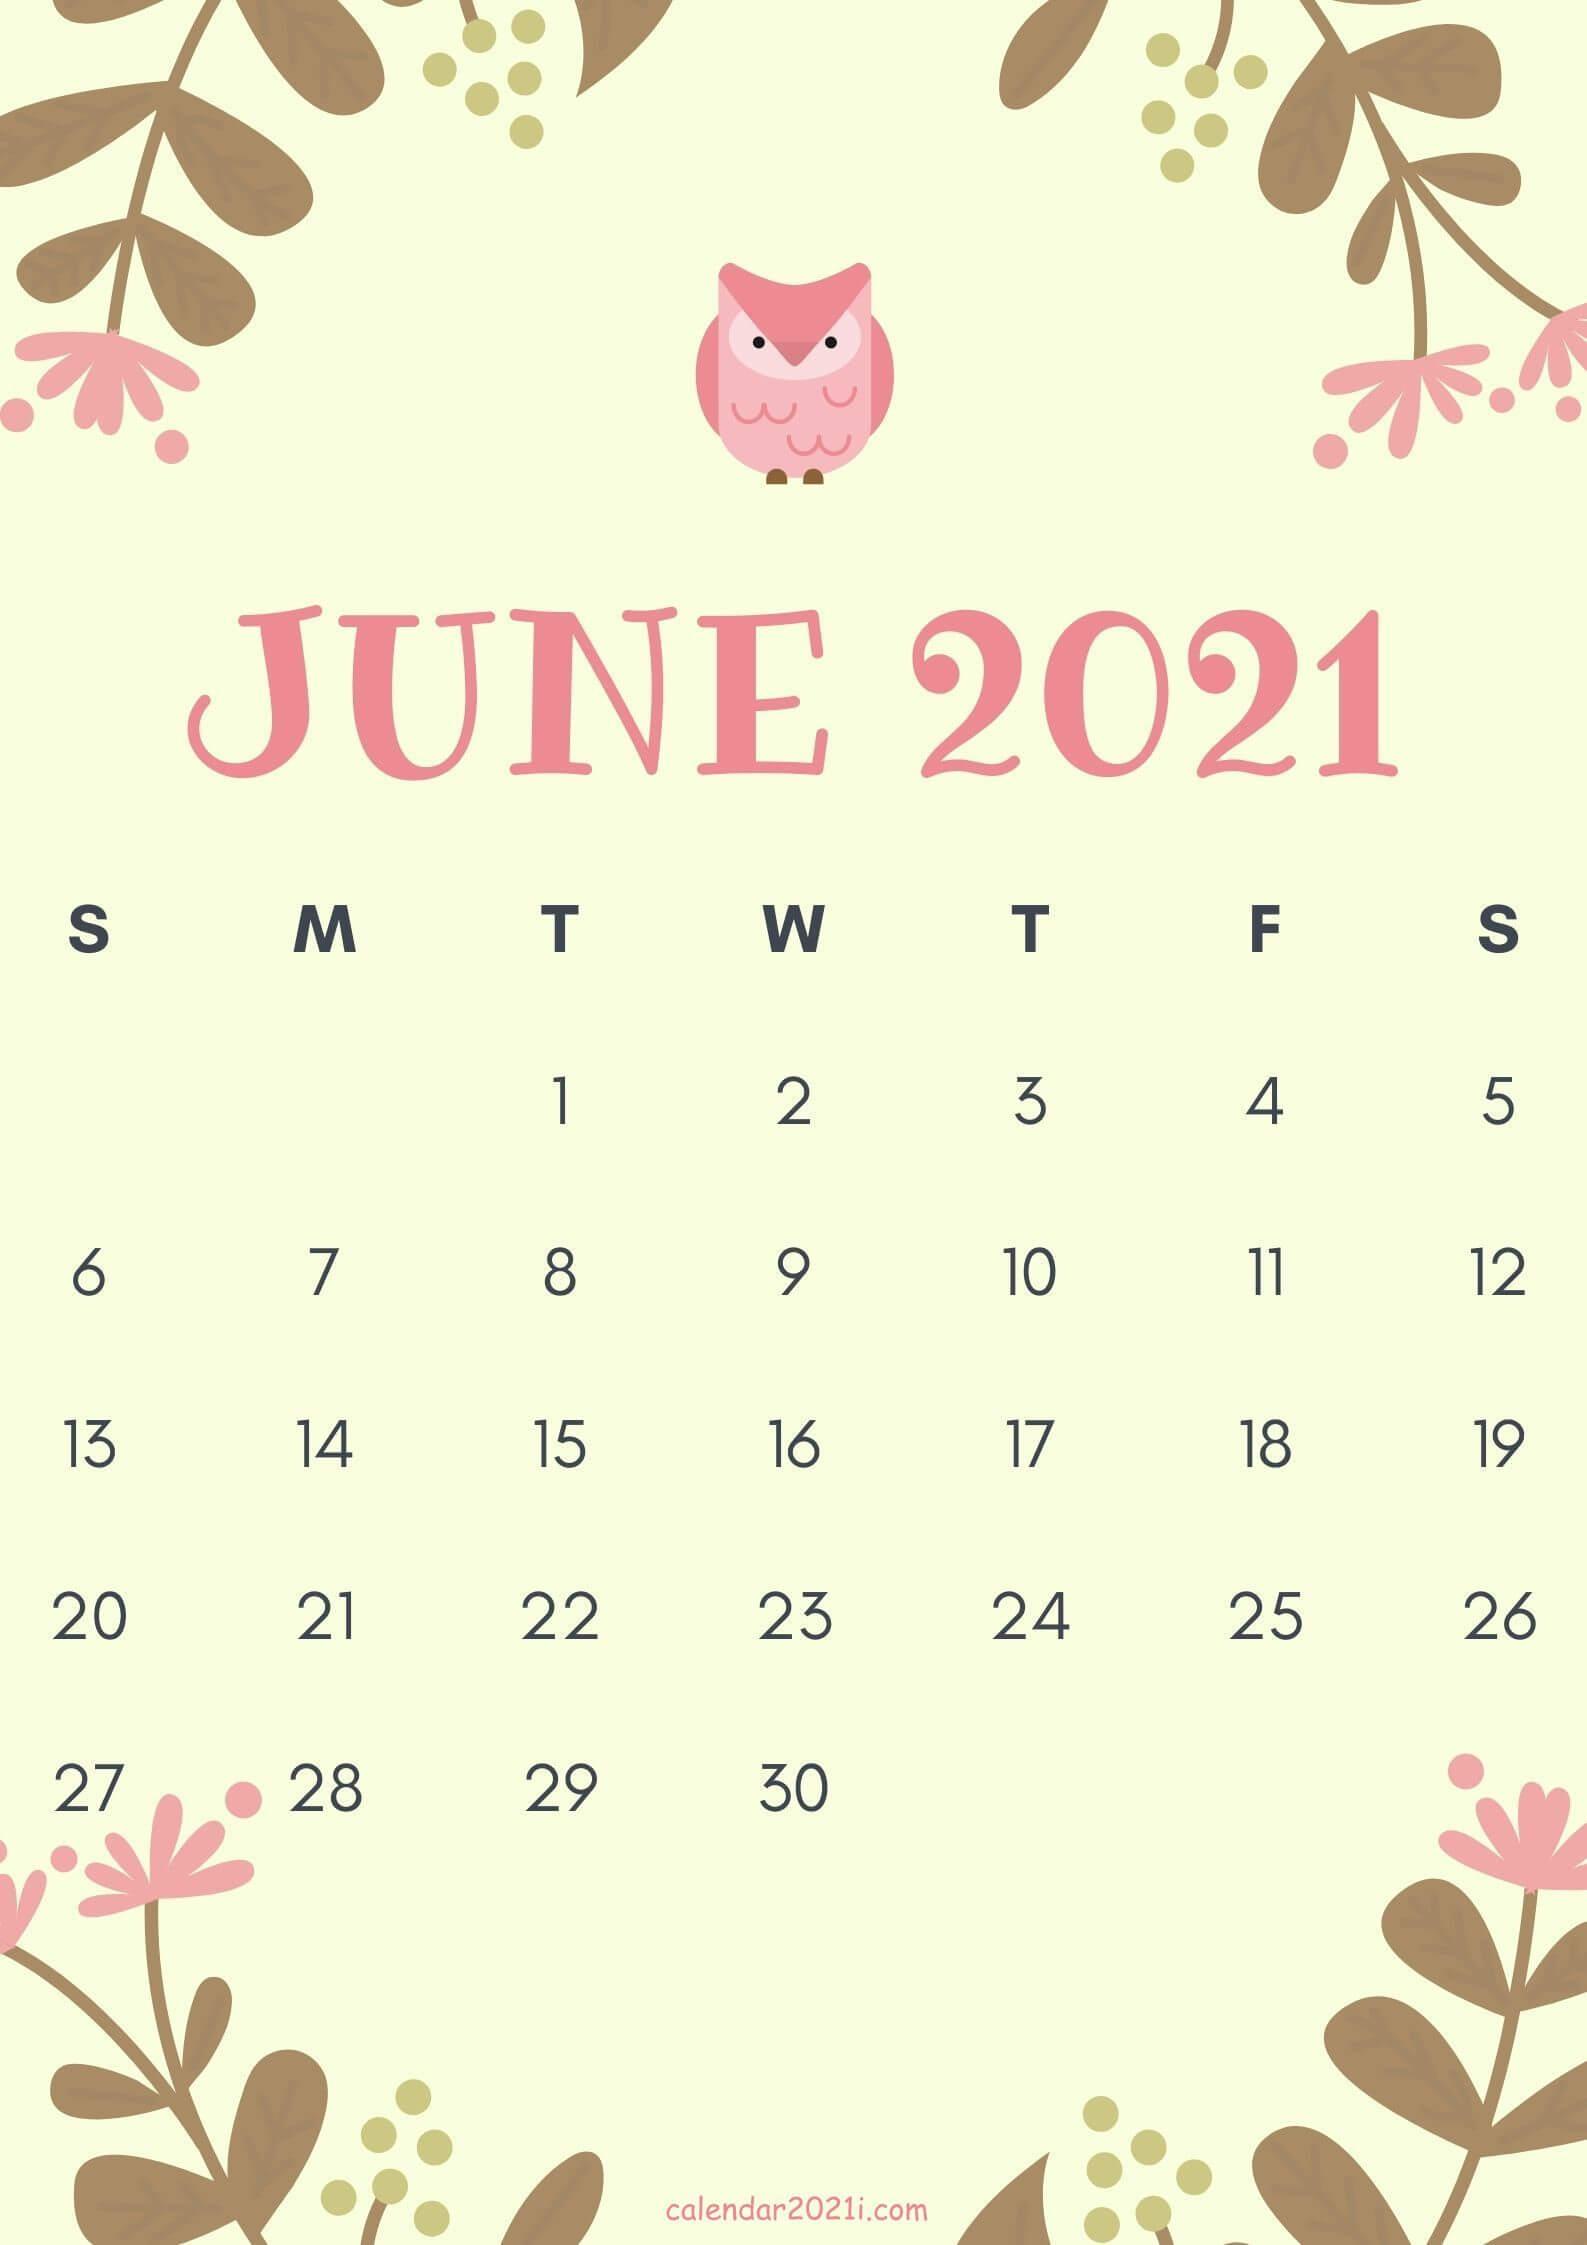 Floral June 2021 Calendar Wallpaper